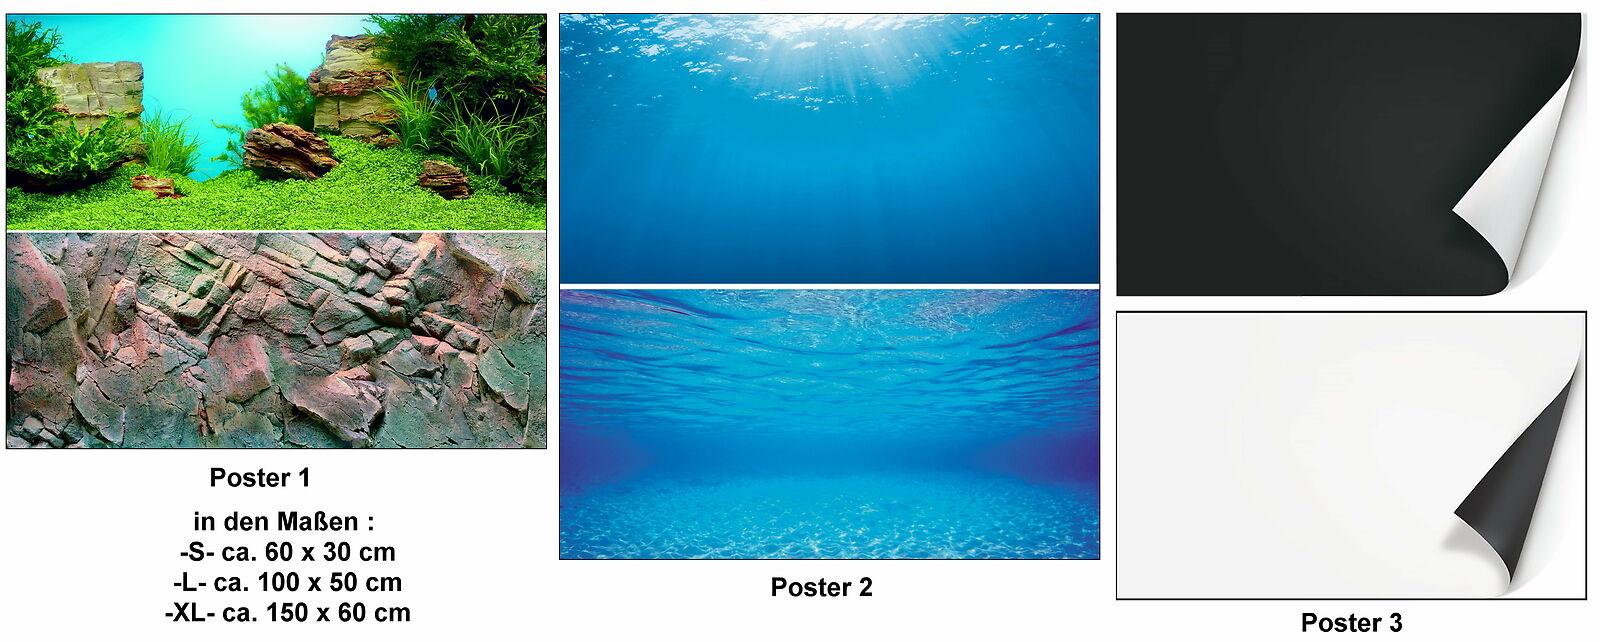 Juwel Aquariumrückwand Poster 1 / 2 / 3 verschiedene Motive und Größen